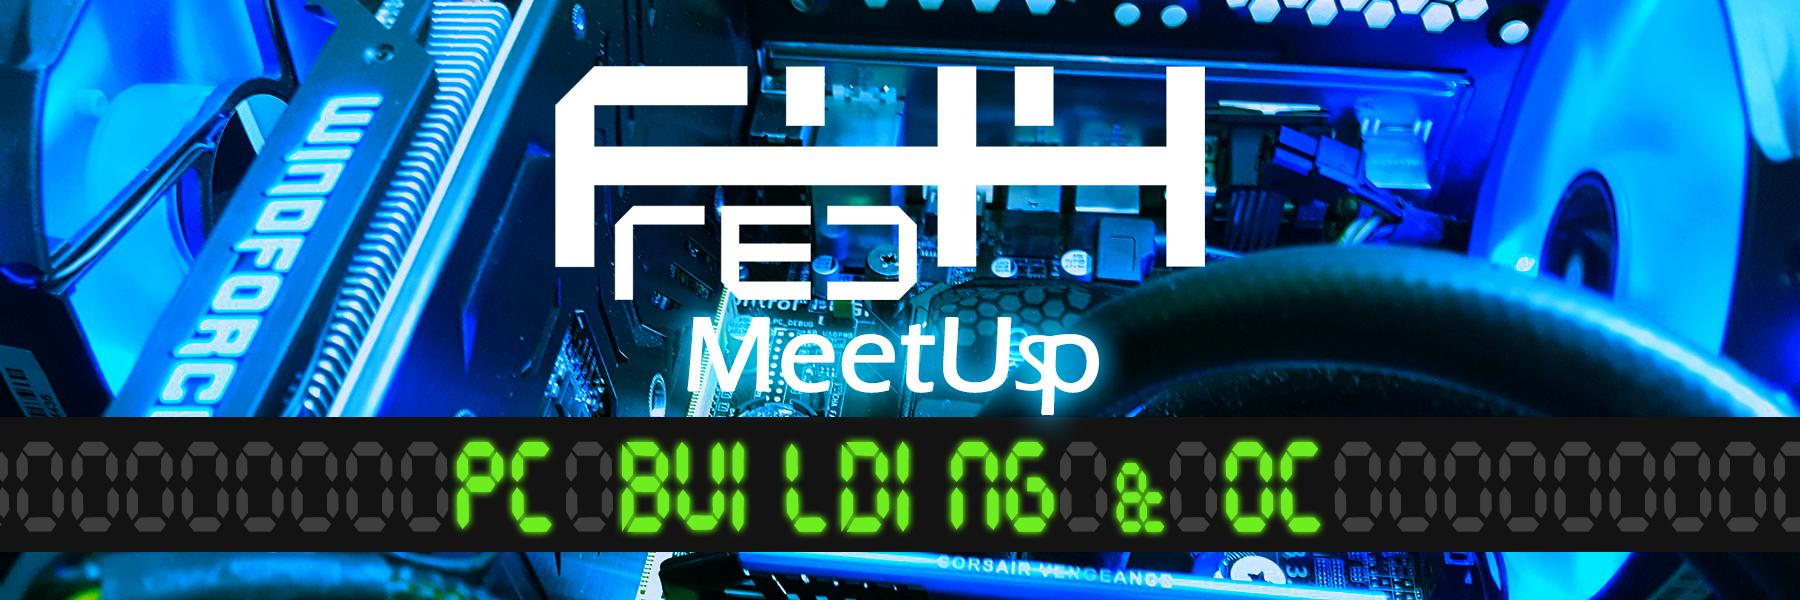 meetup-pcbuildingandOC